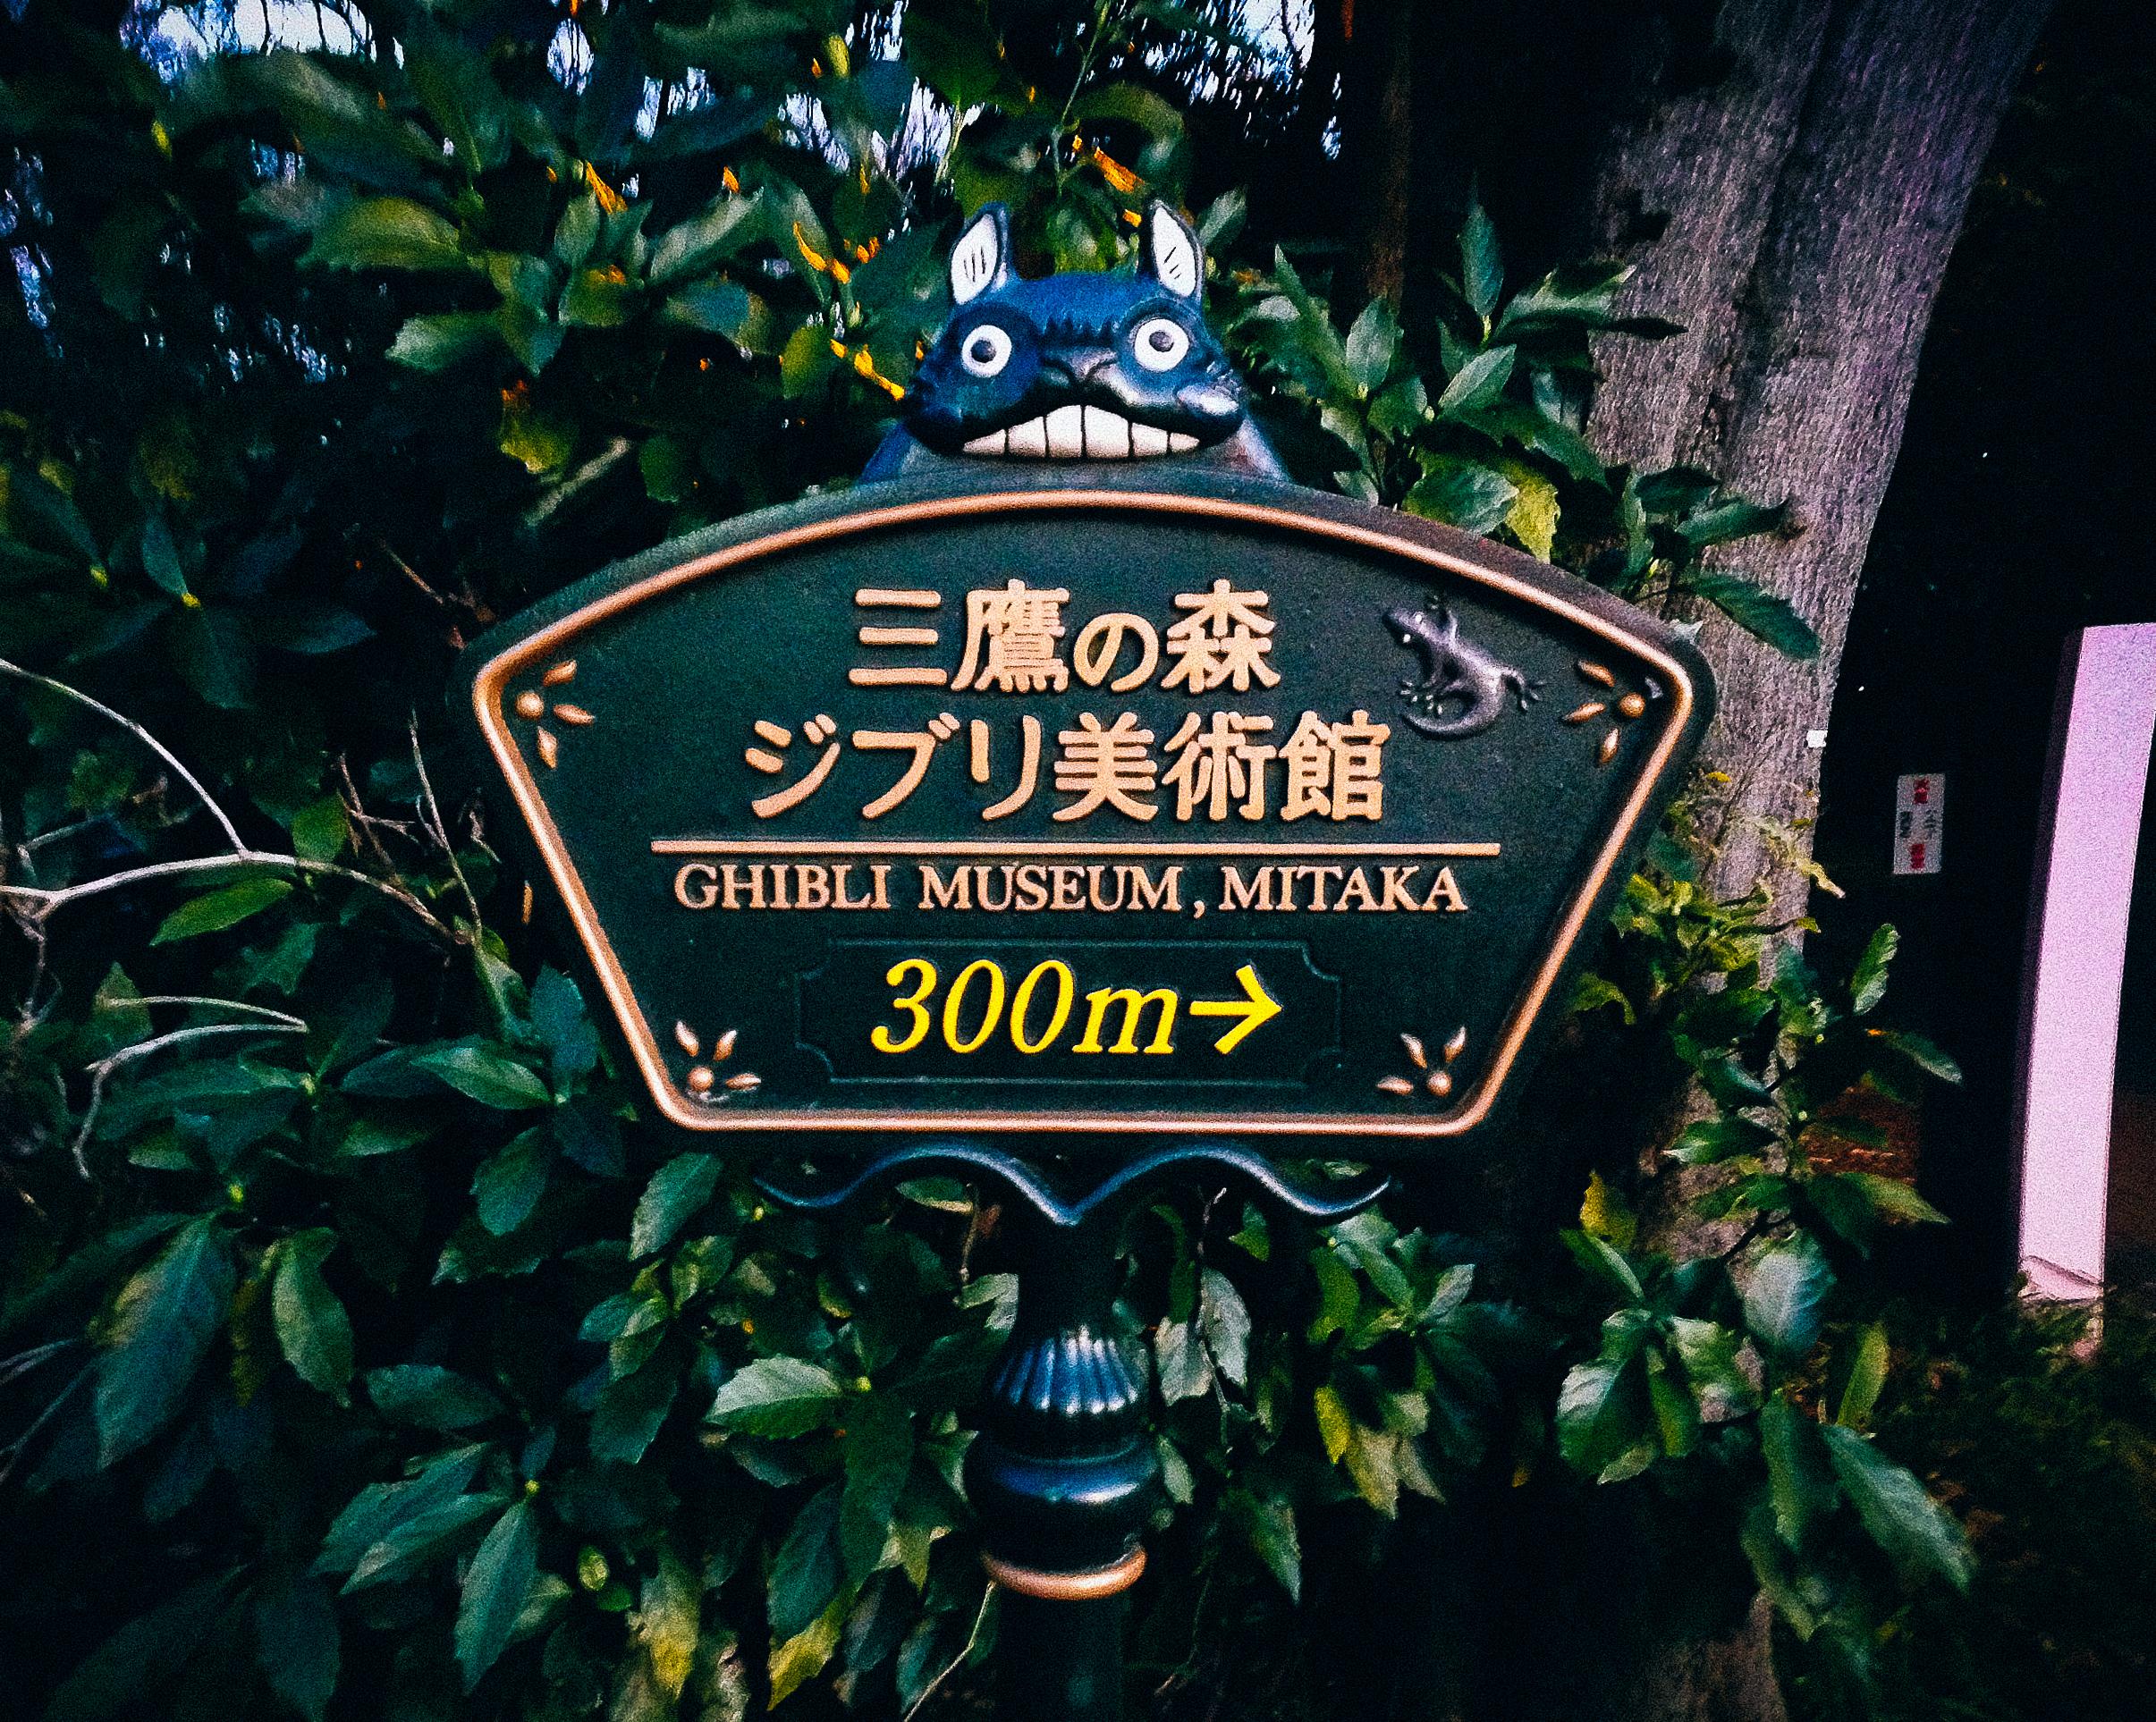 Studio Ghibli Museum Walking Sign in Mitaka by Eric Bravo Photography